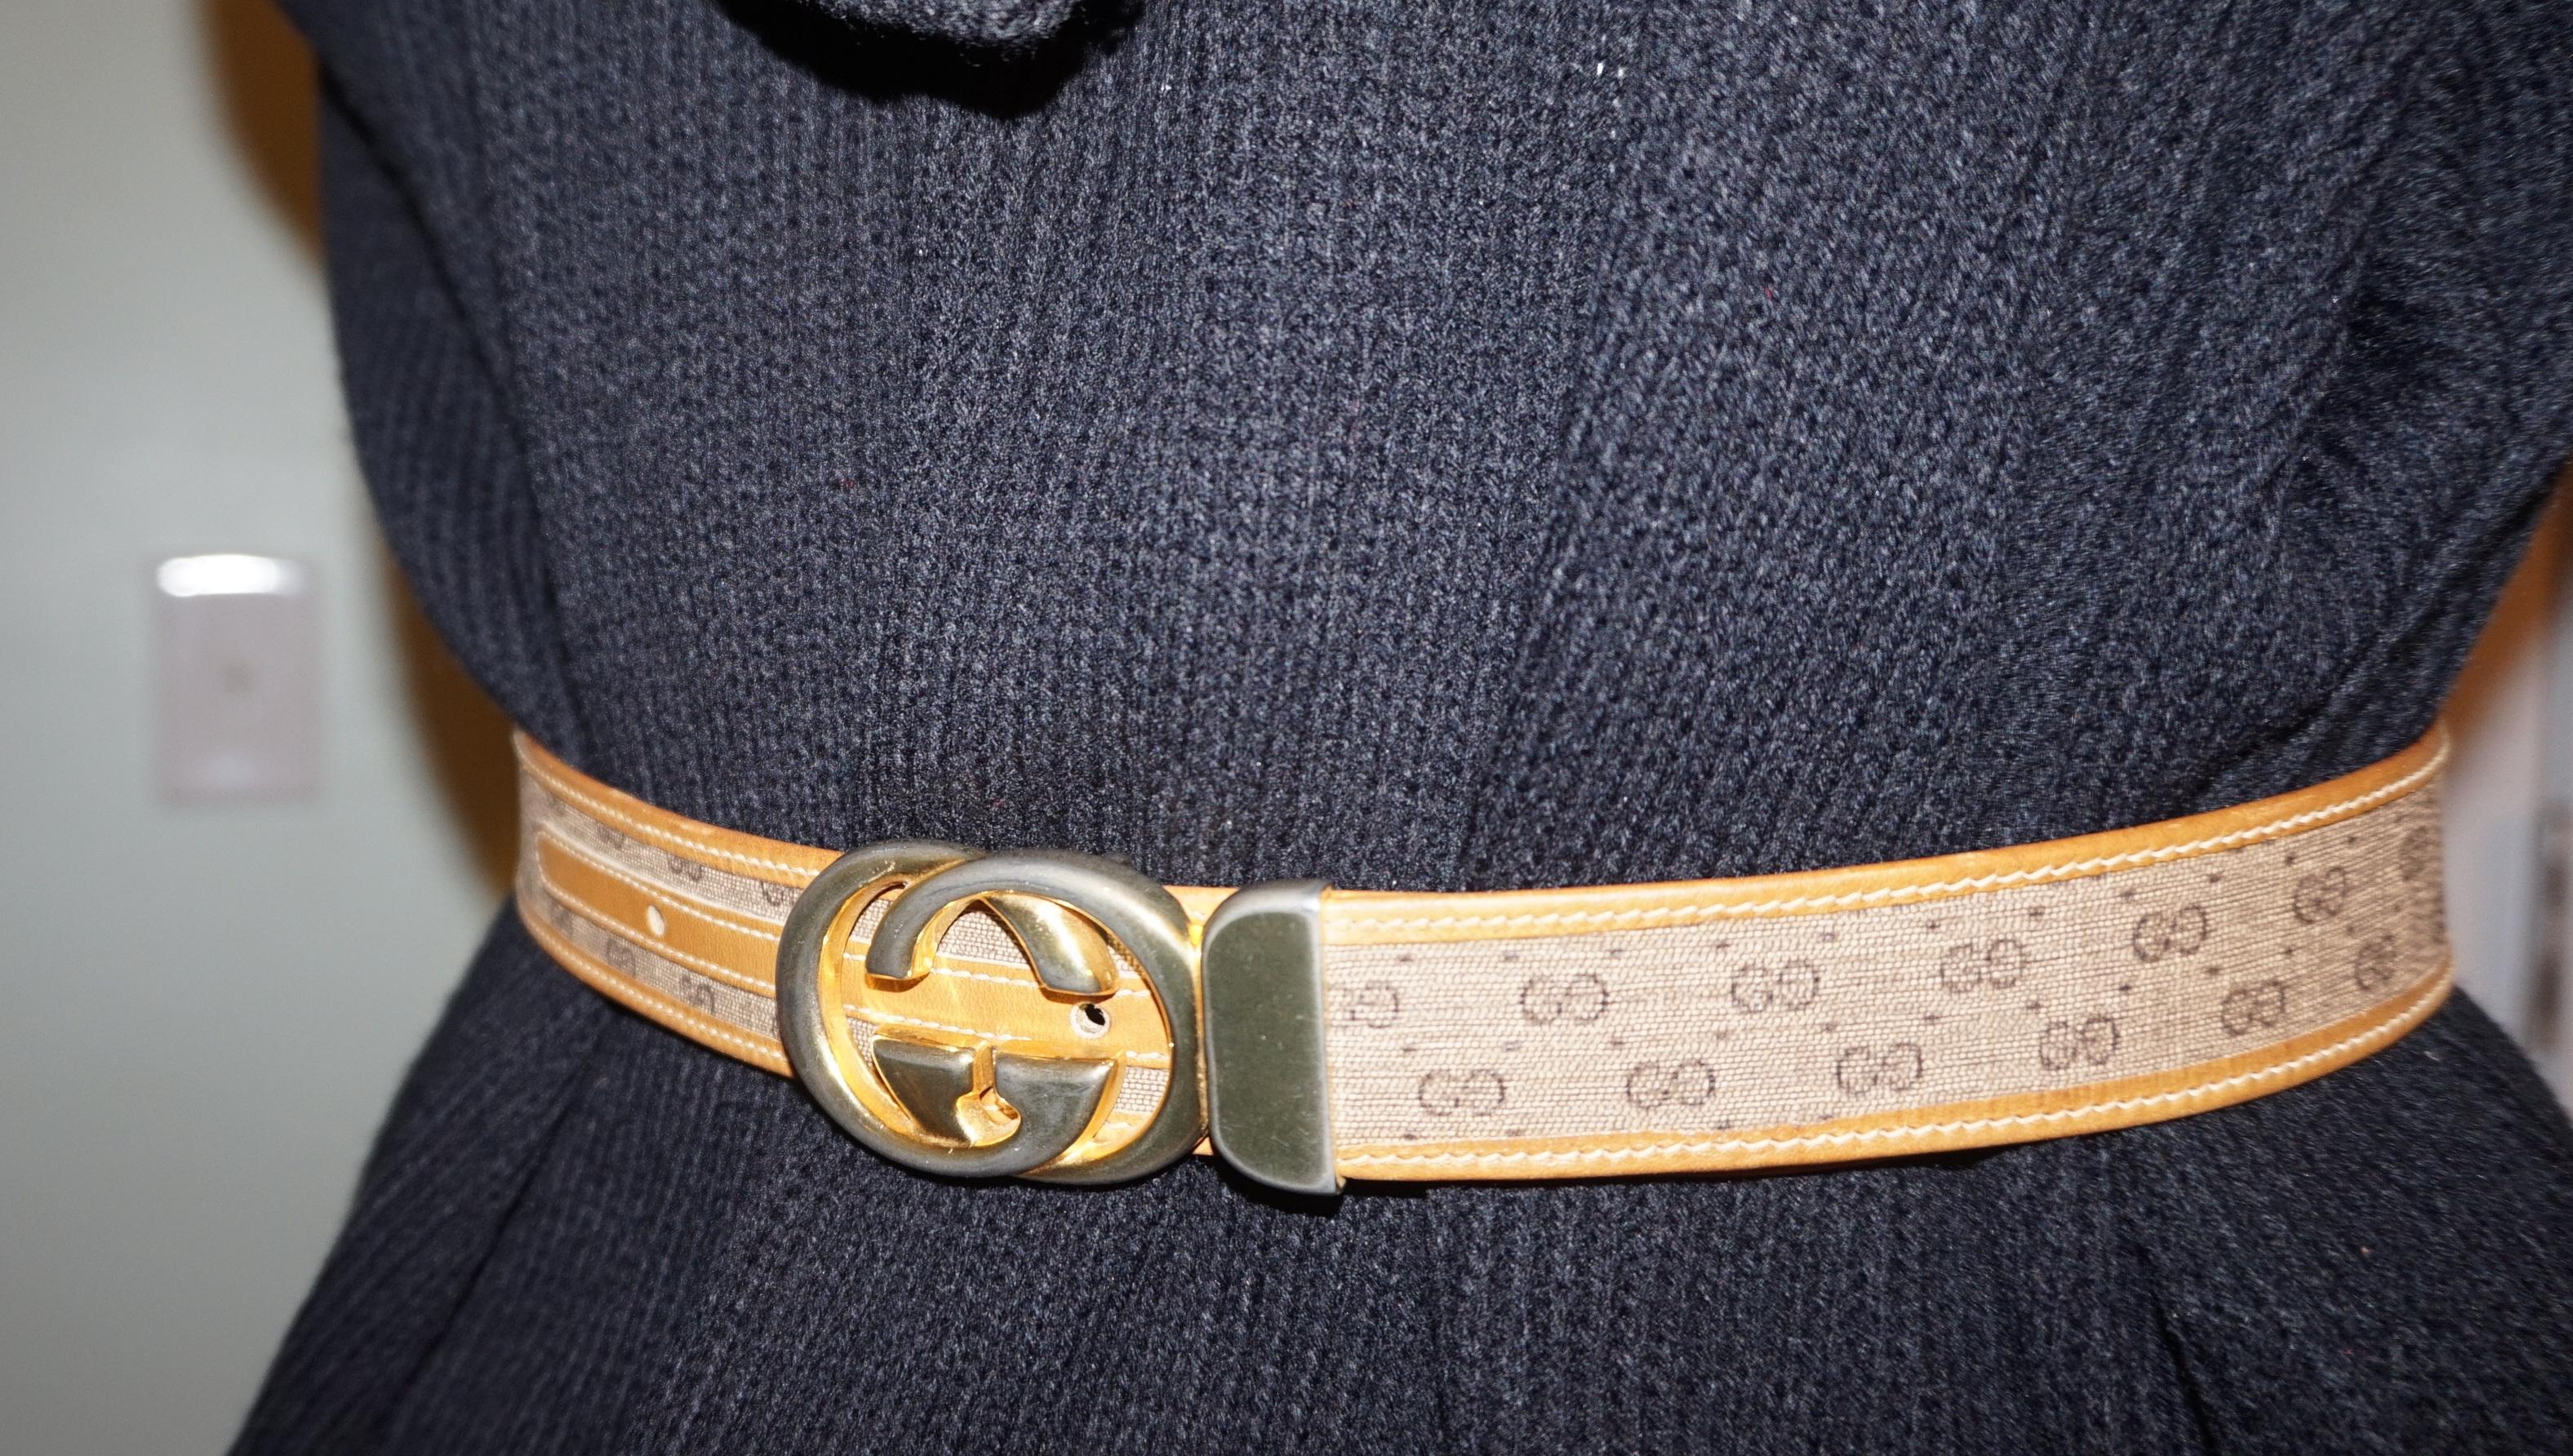 e0536fd23 Divaxpress Resale | Vintage Authentic Gucci Belt Size 28 or Small ...